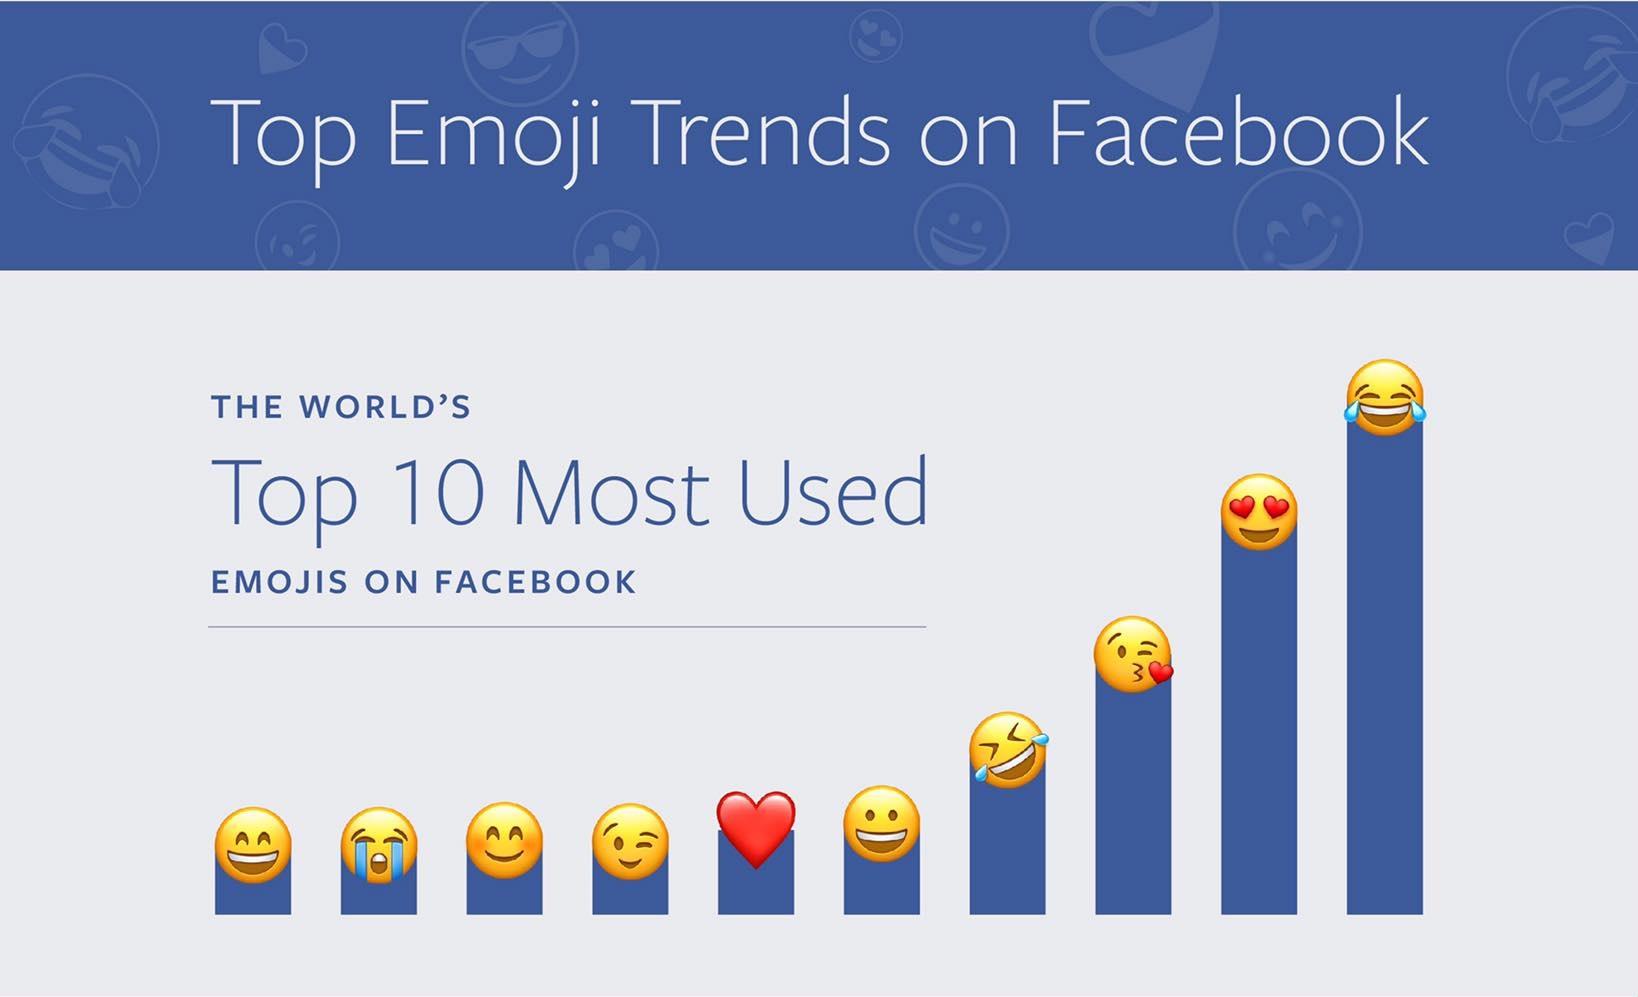 Top Emoji Trends On Facebook